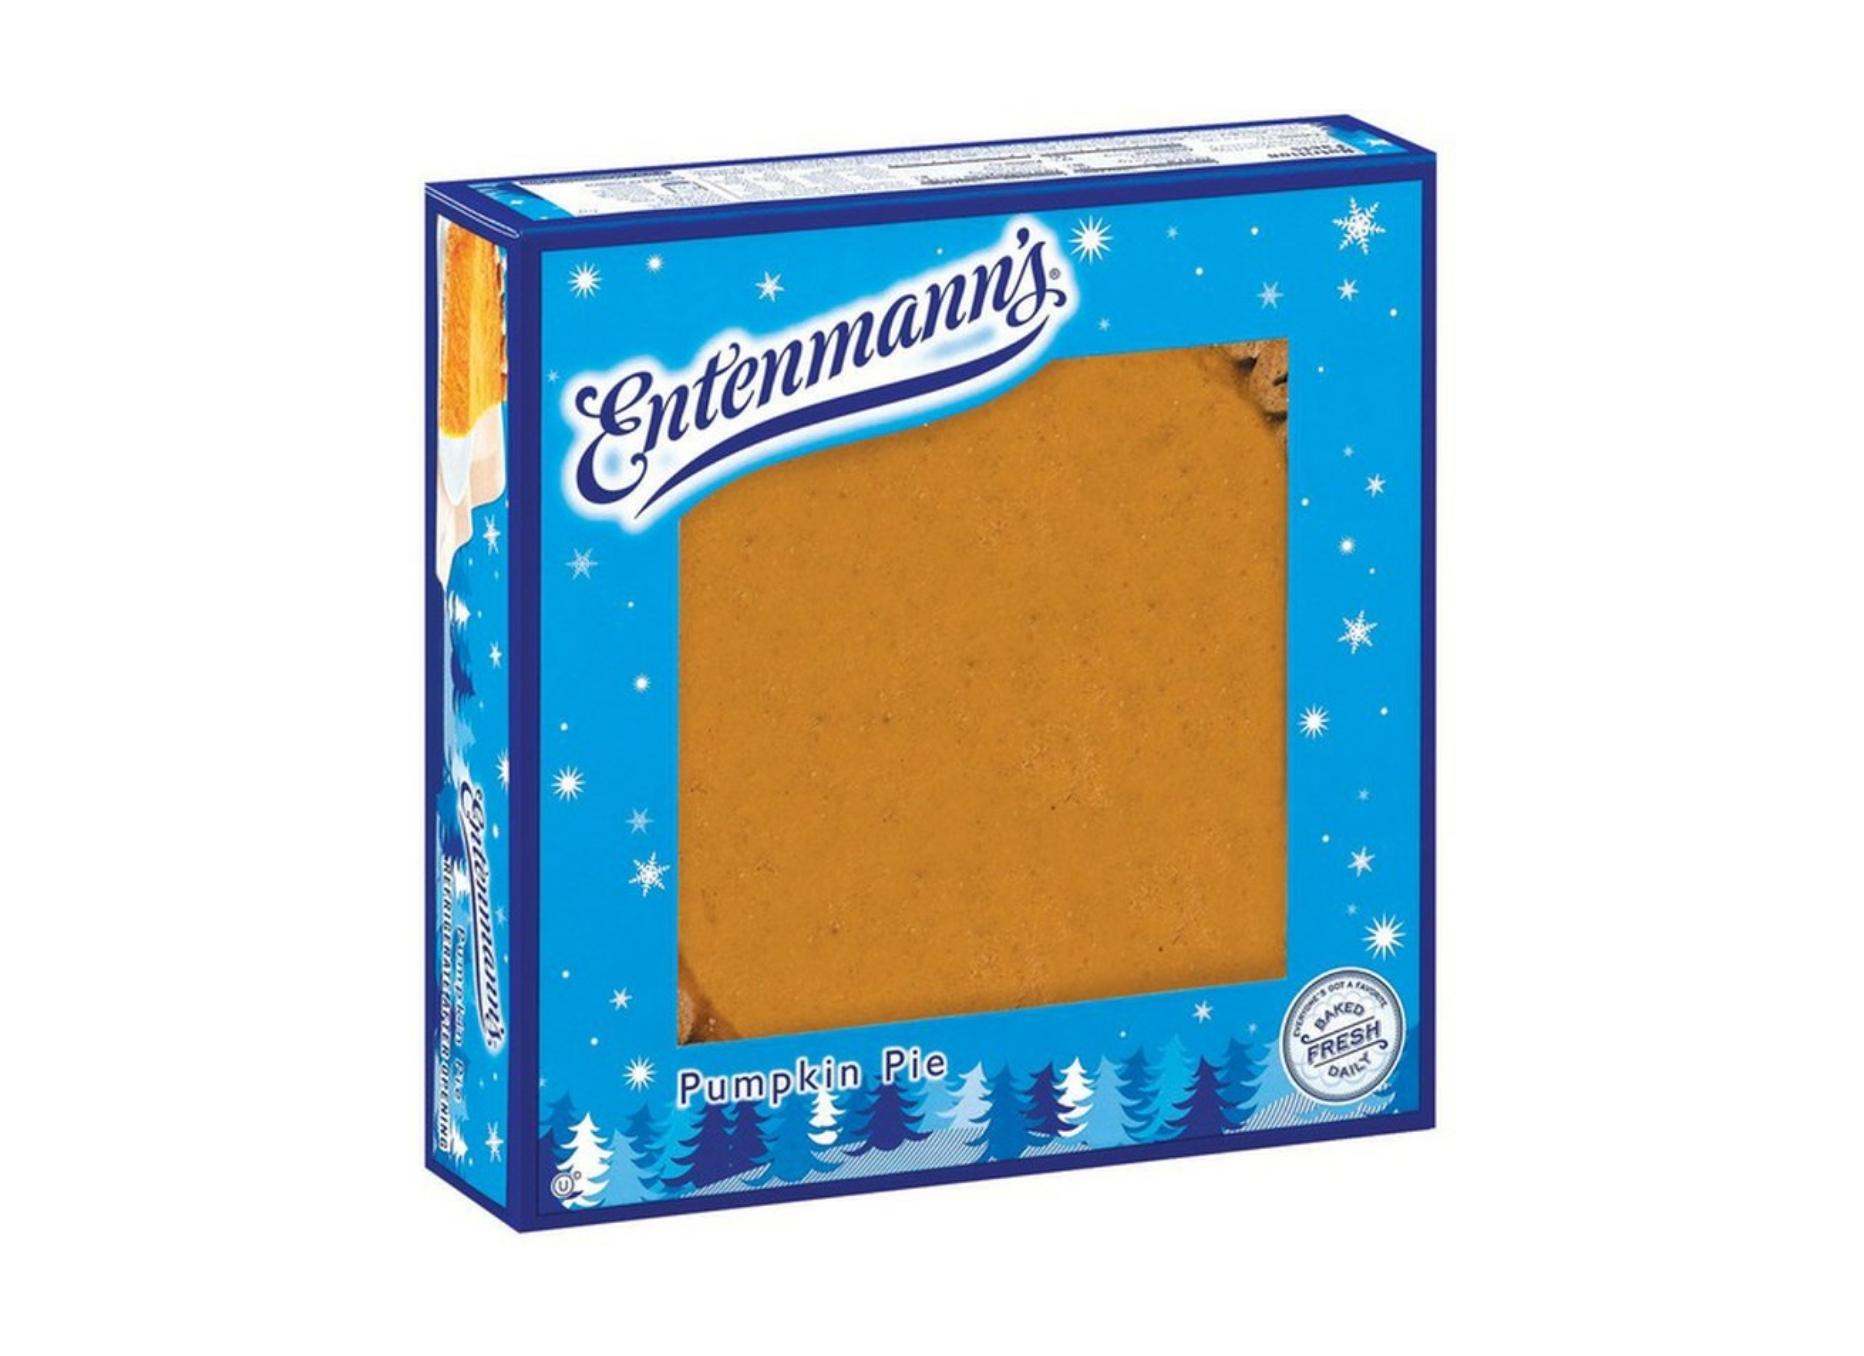 Entenmann's Pumpkin Pie